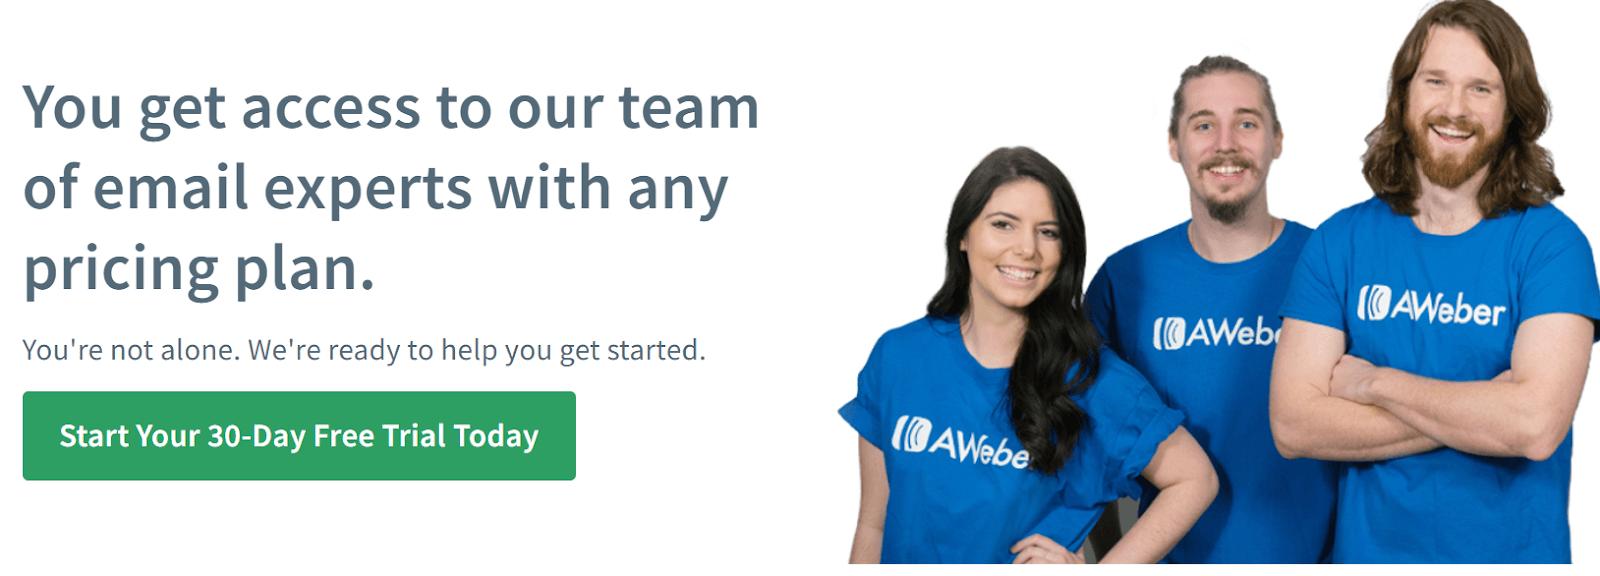 AWeber Mailchimp alternative